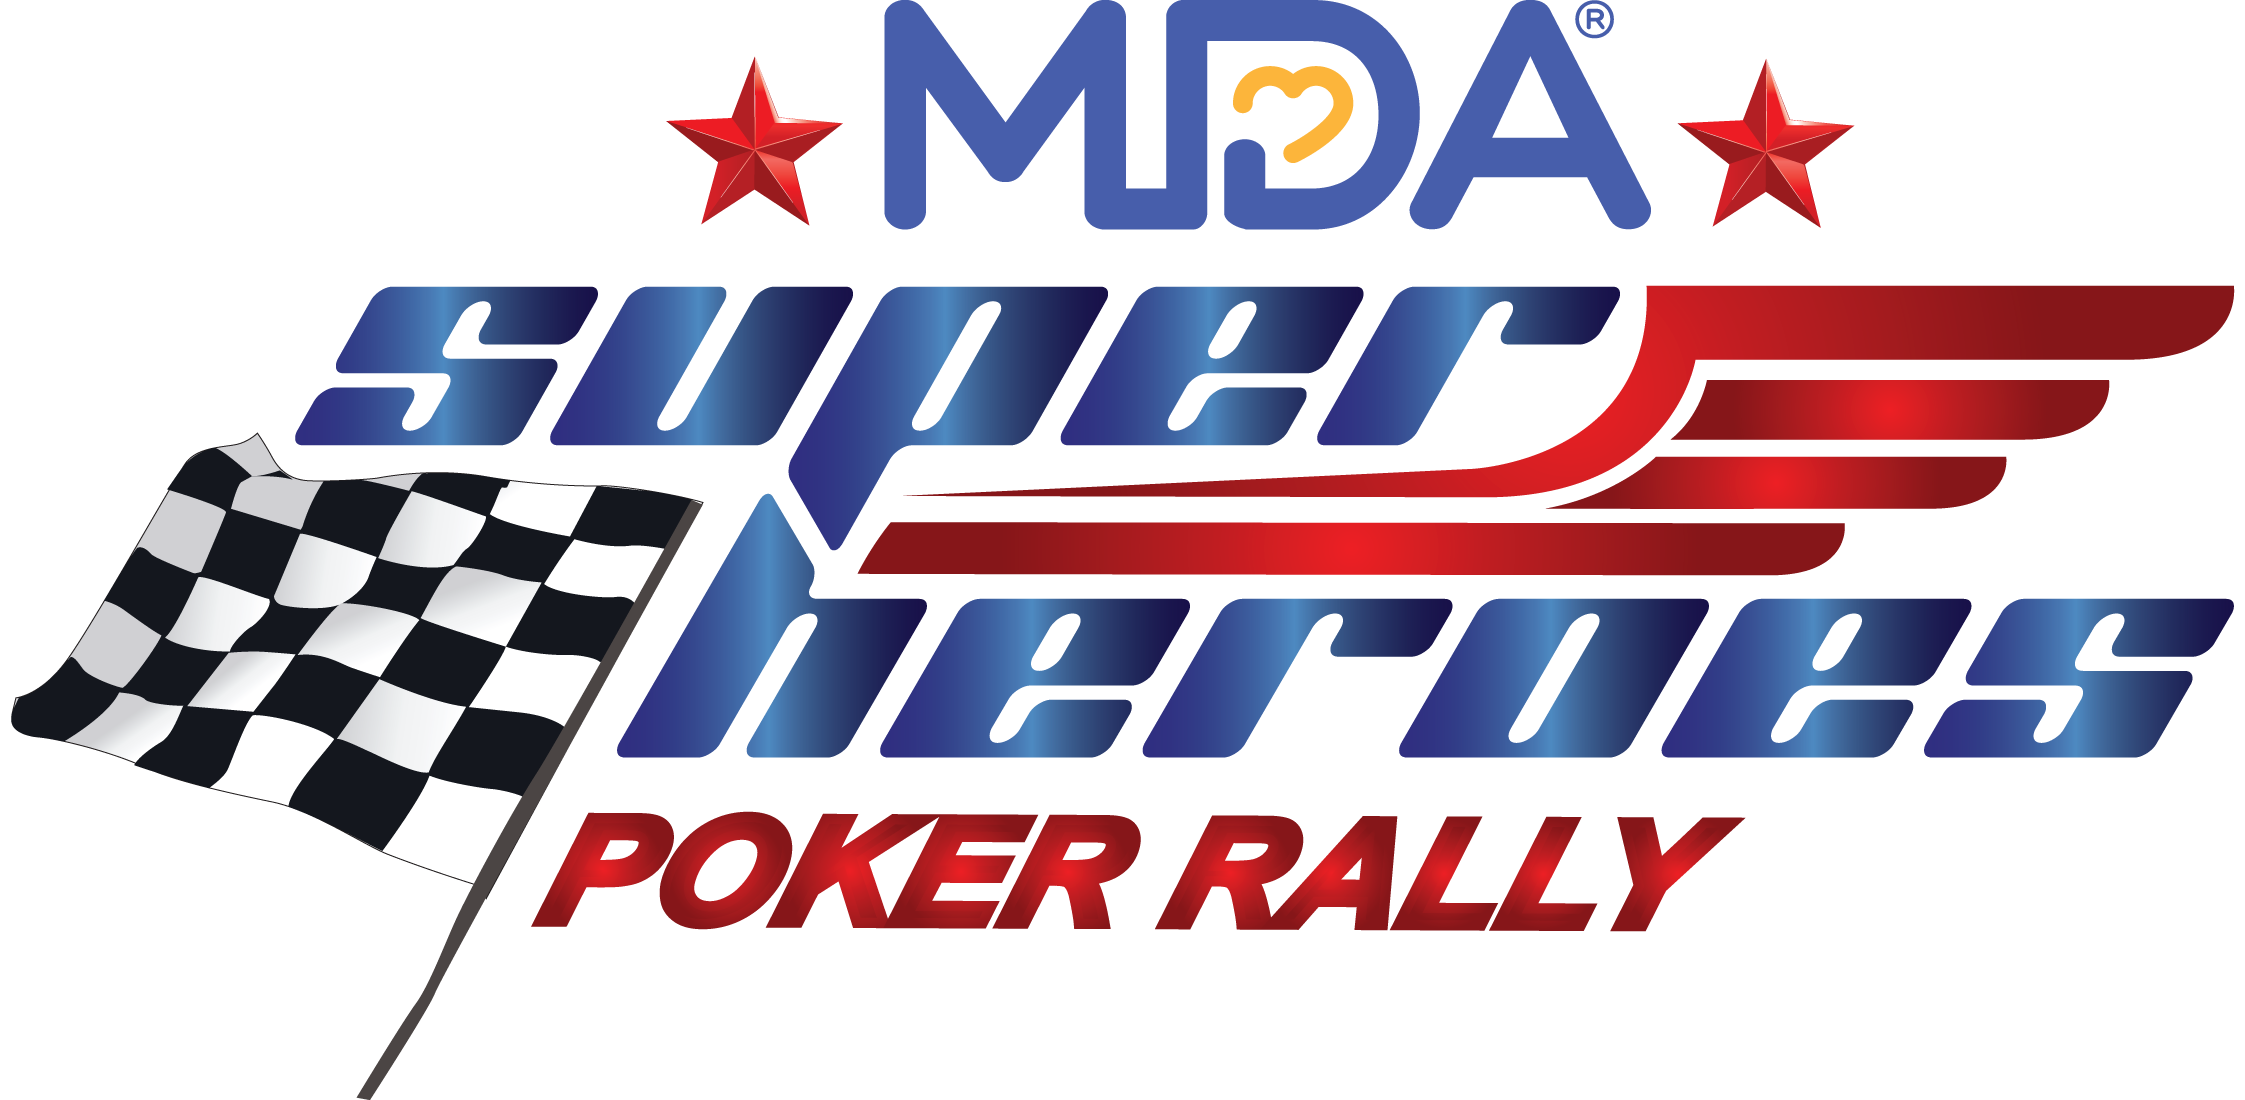 logo mda_super heroe_rally_final.png